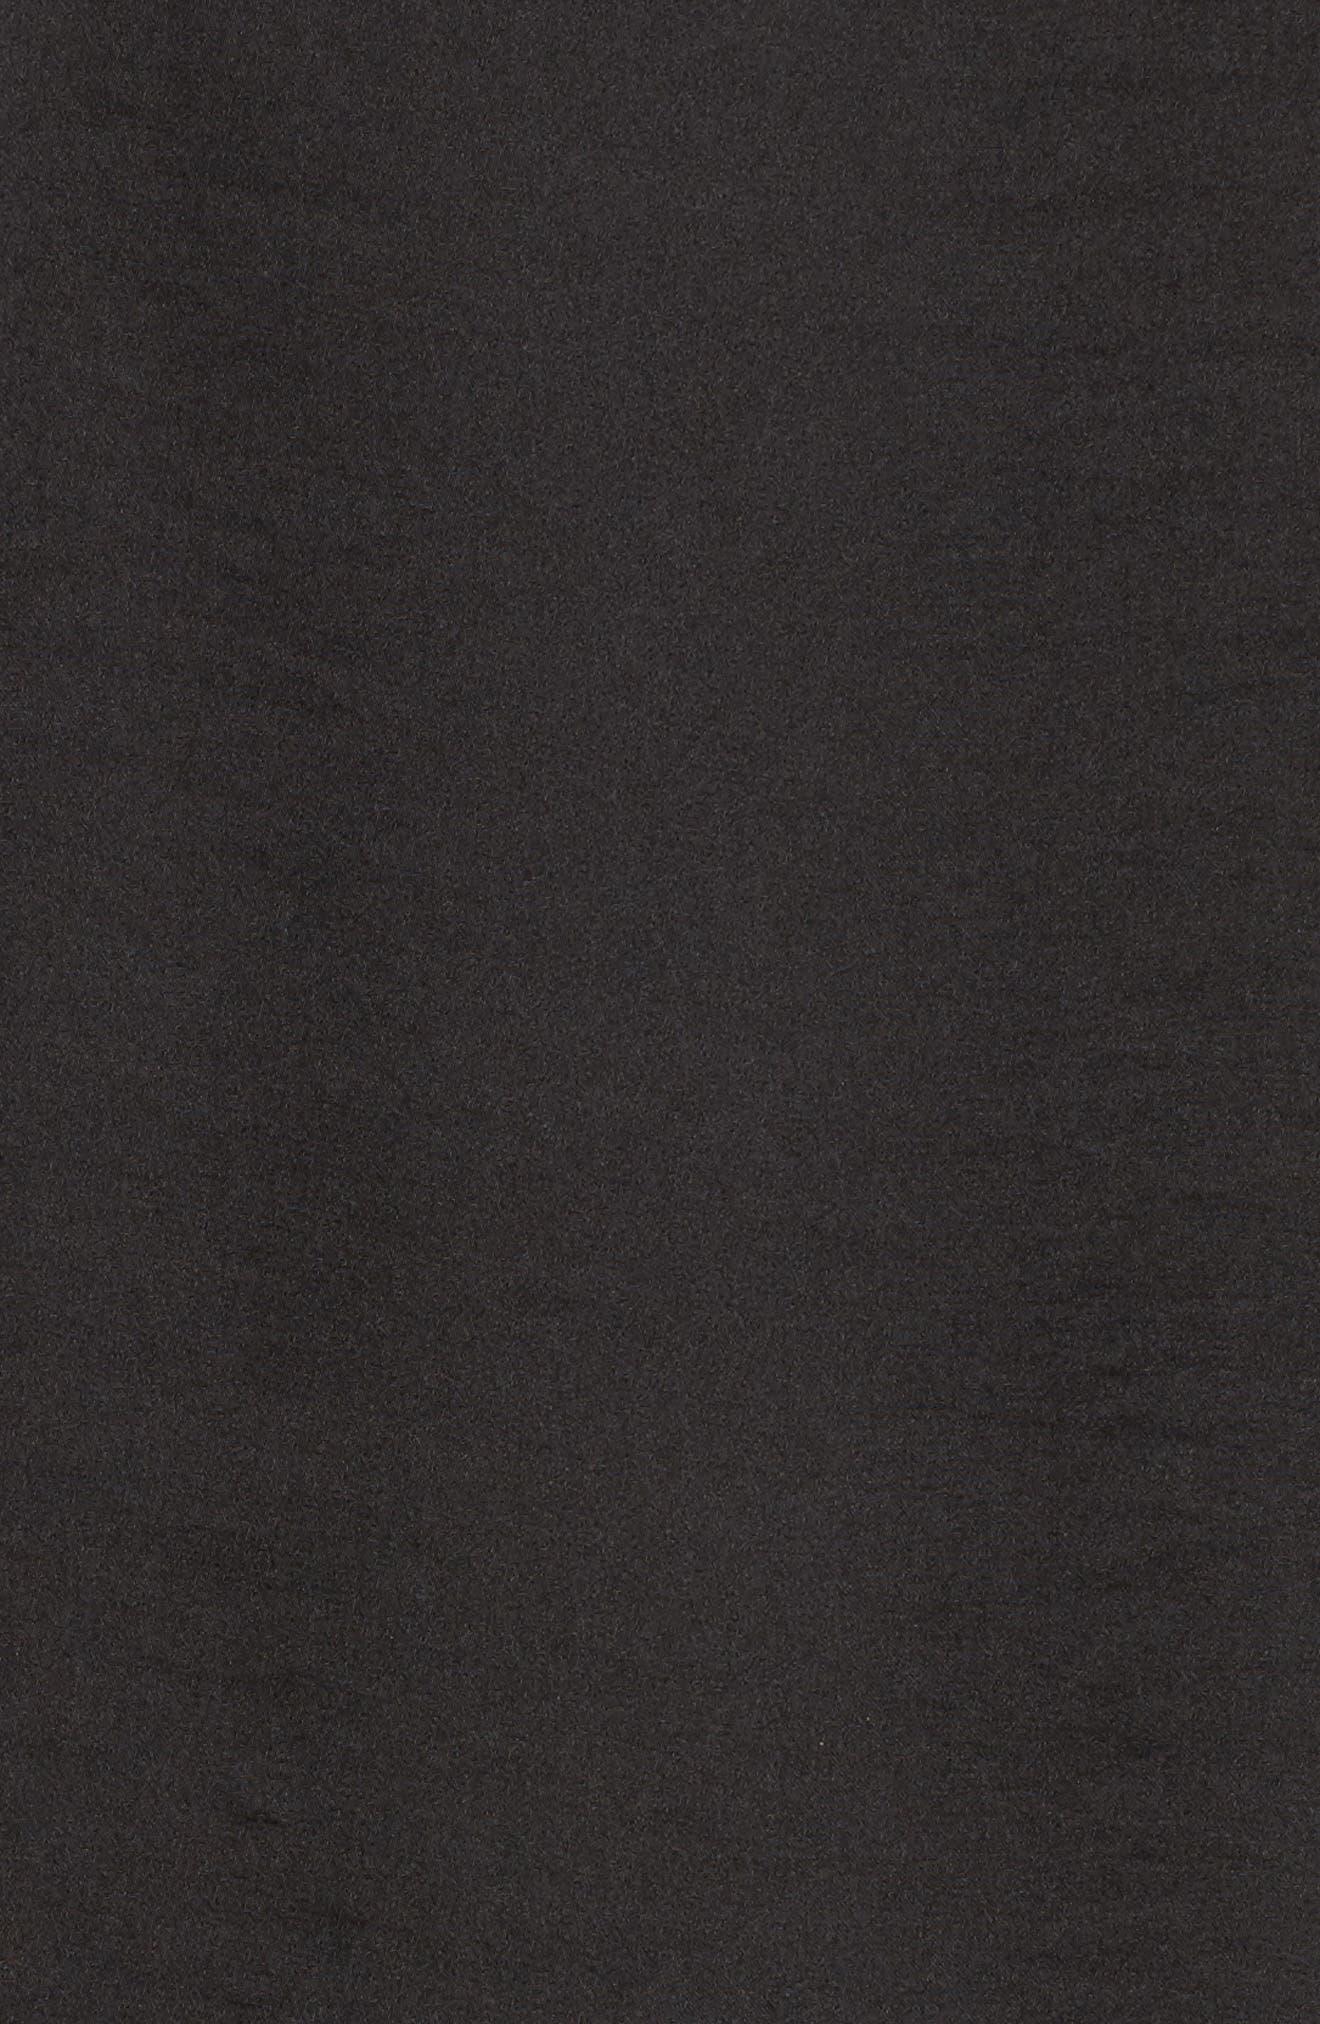 Bell Sleeve Hammered Satin Blouse,                             Alternate thumbnail 17, color,